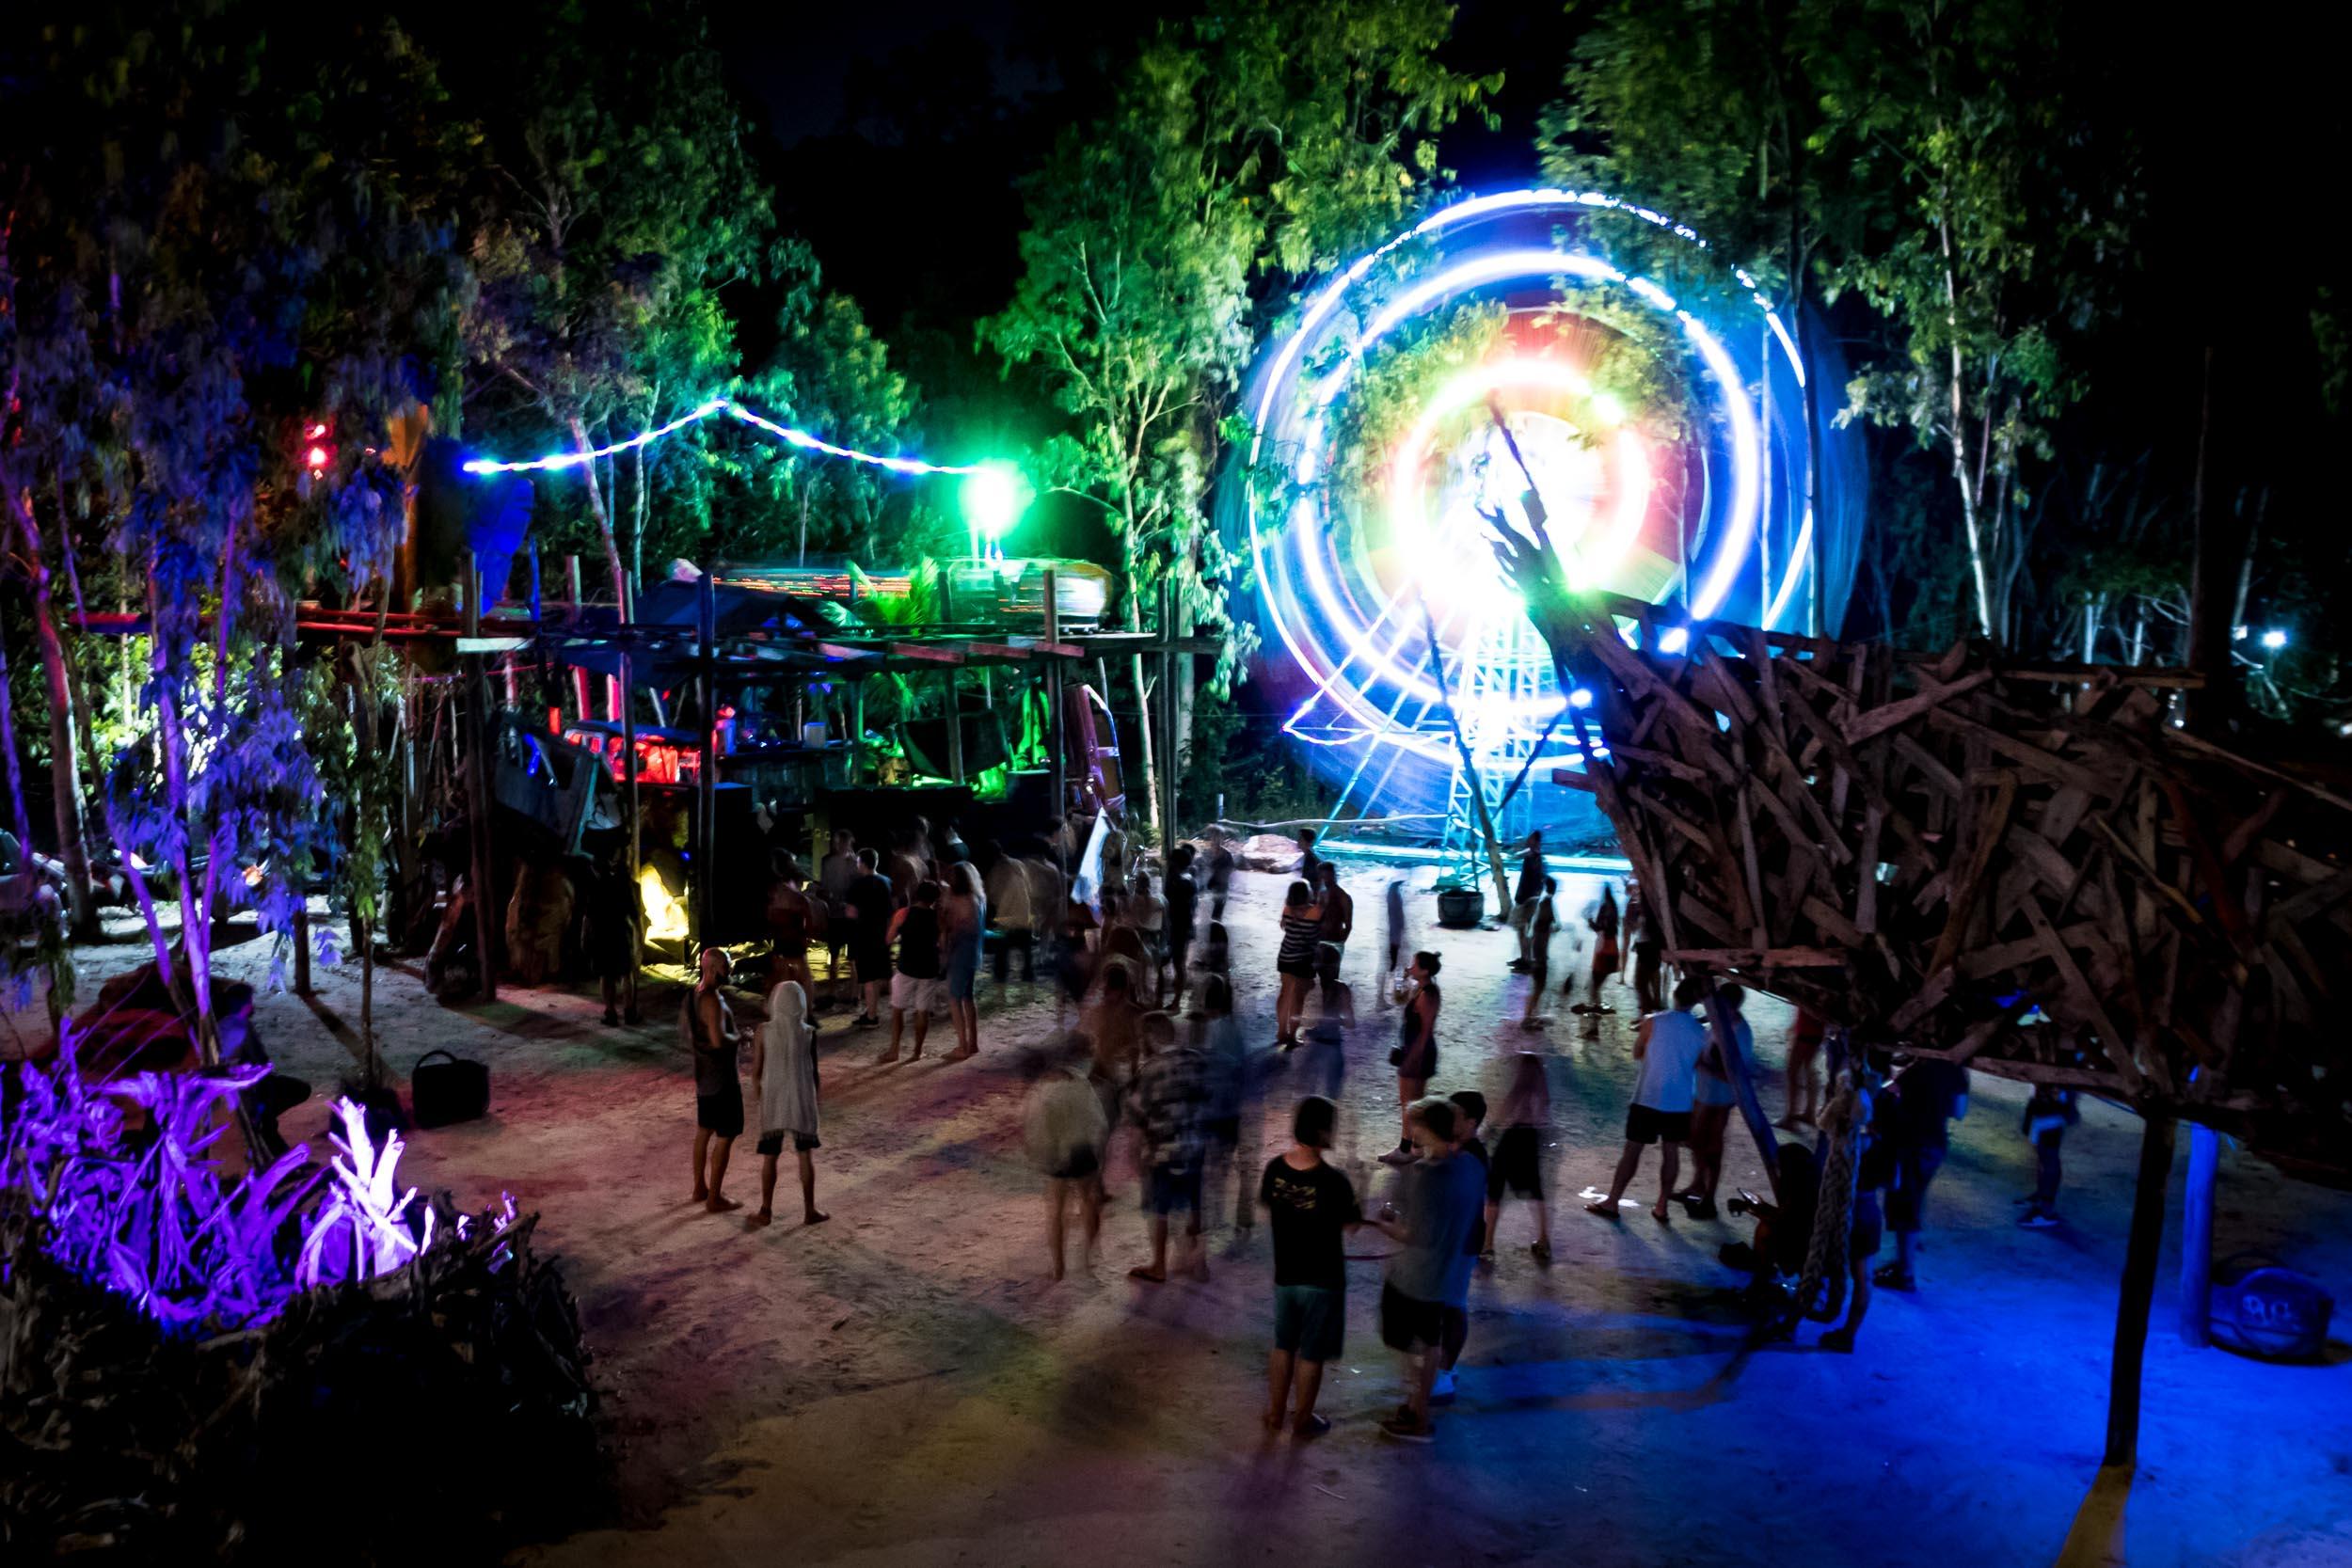 Kerfuffle - Ferris Wheel - Jungle Party